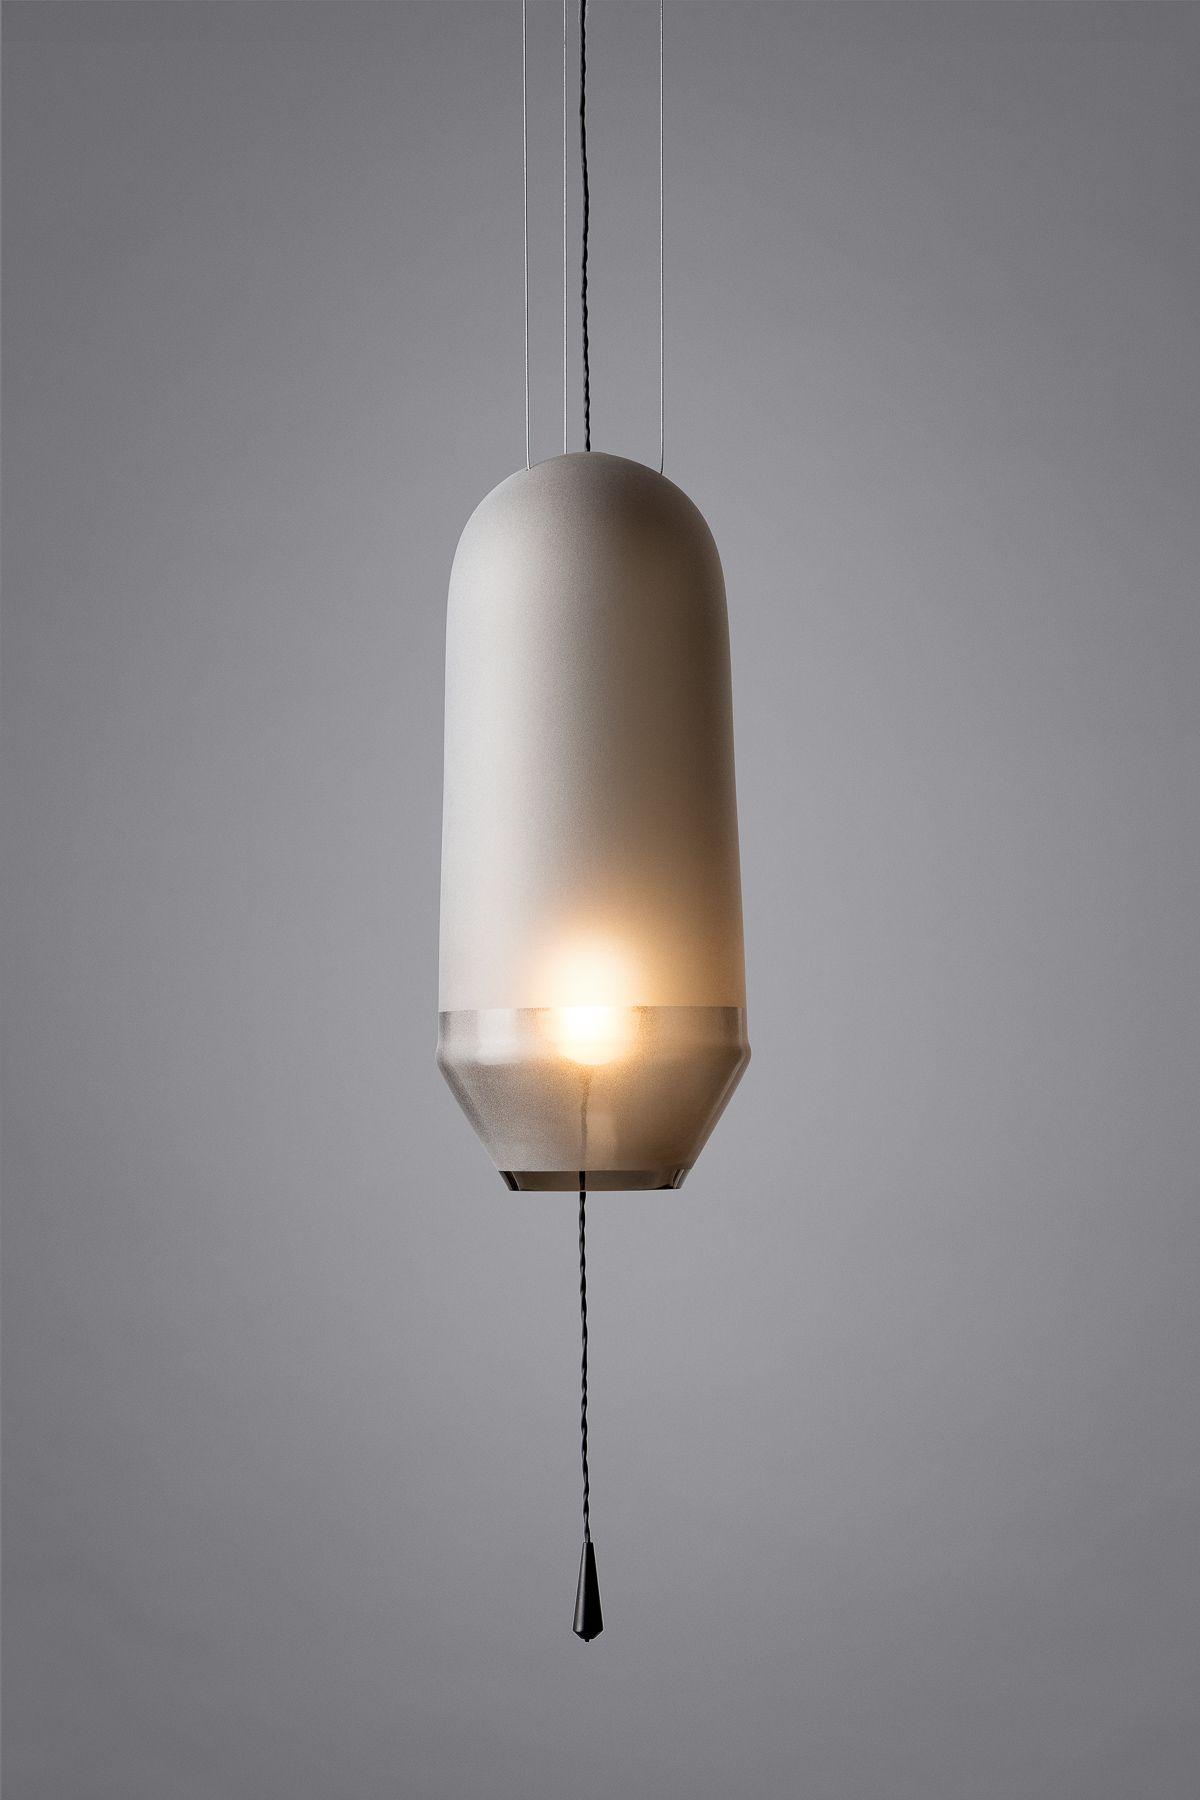 Limpid Light by Esther Jongsma on CROWDYHOUSE ✓Unique Design